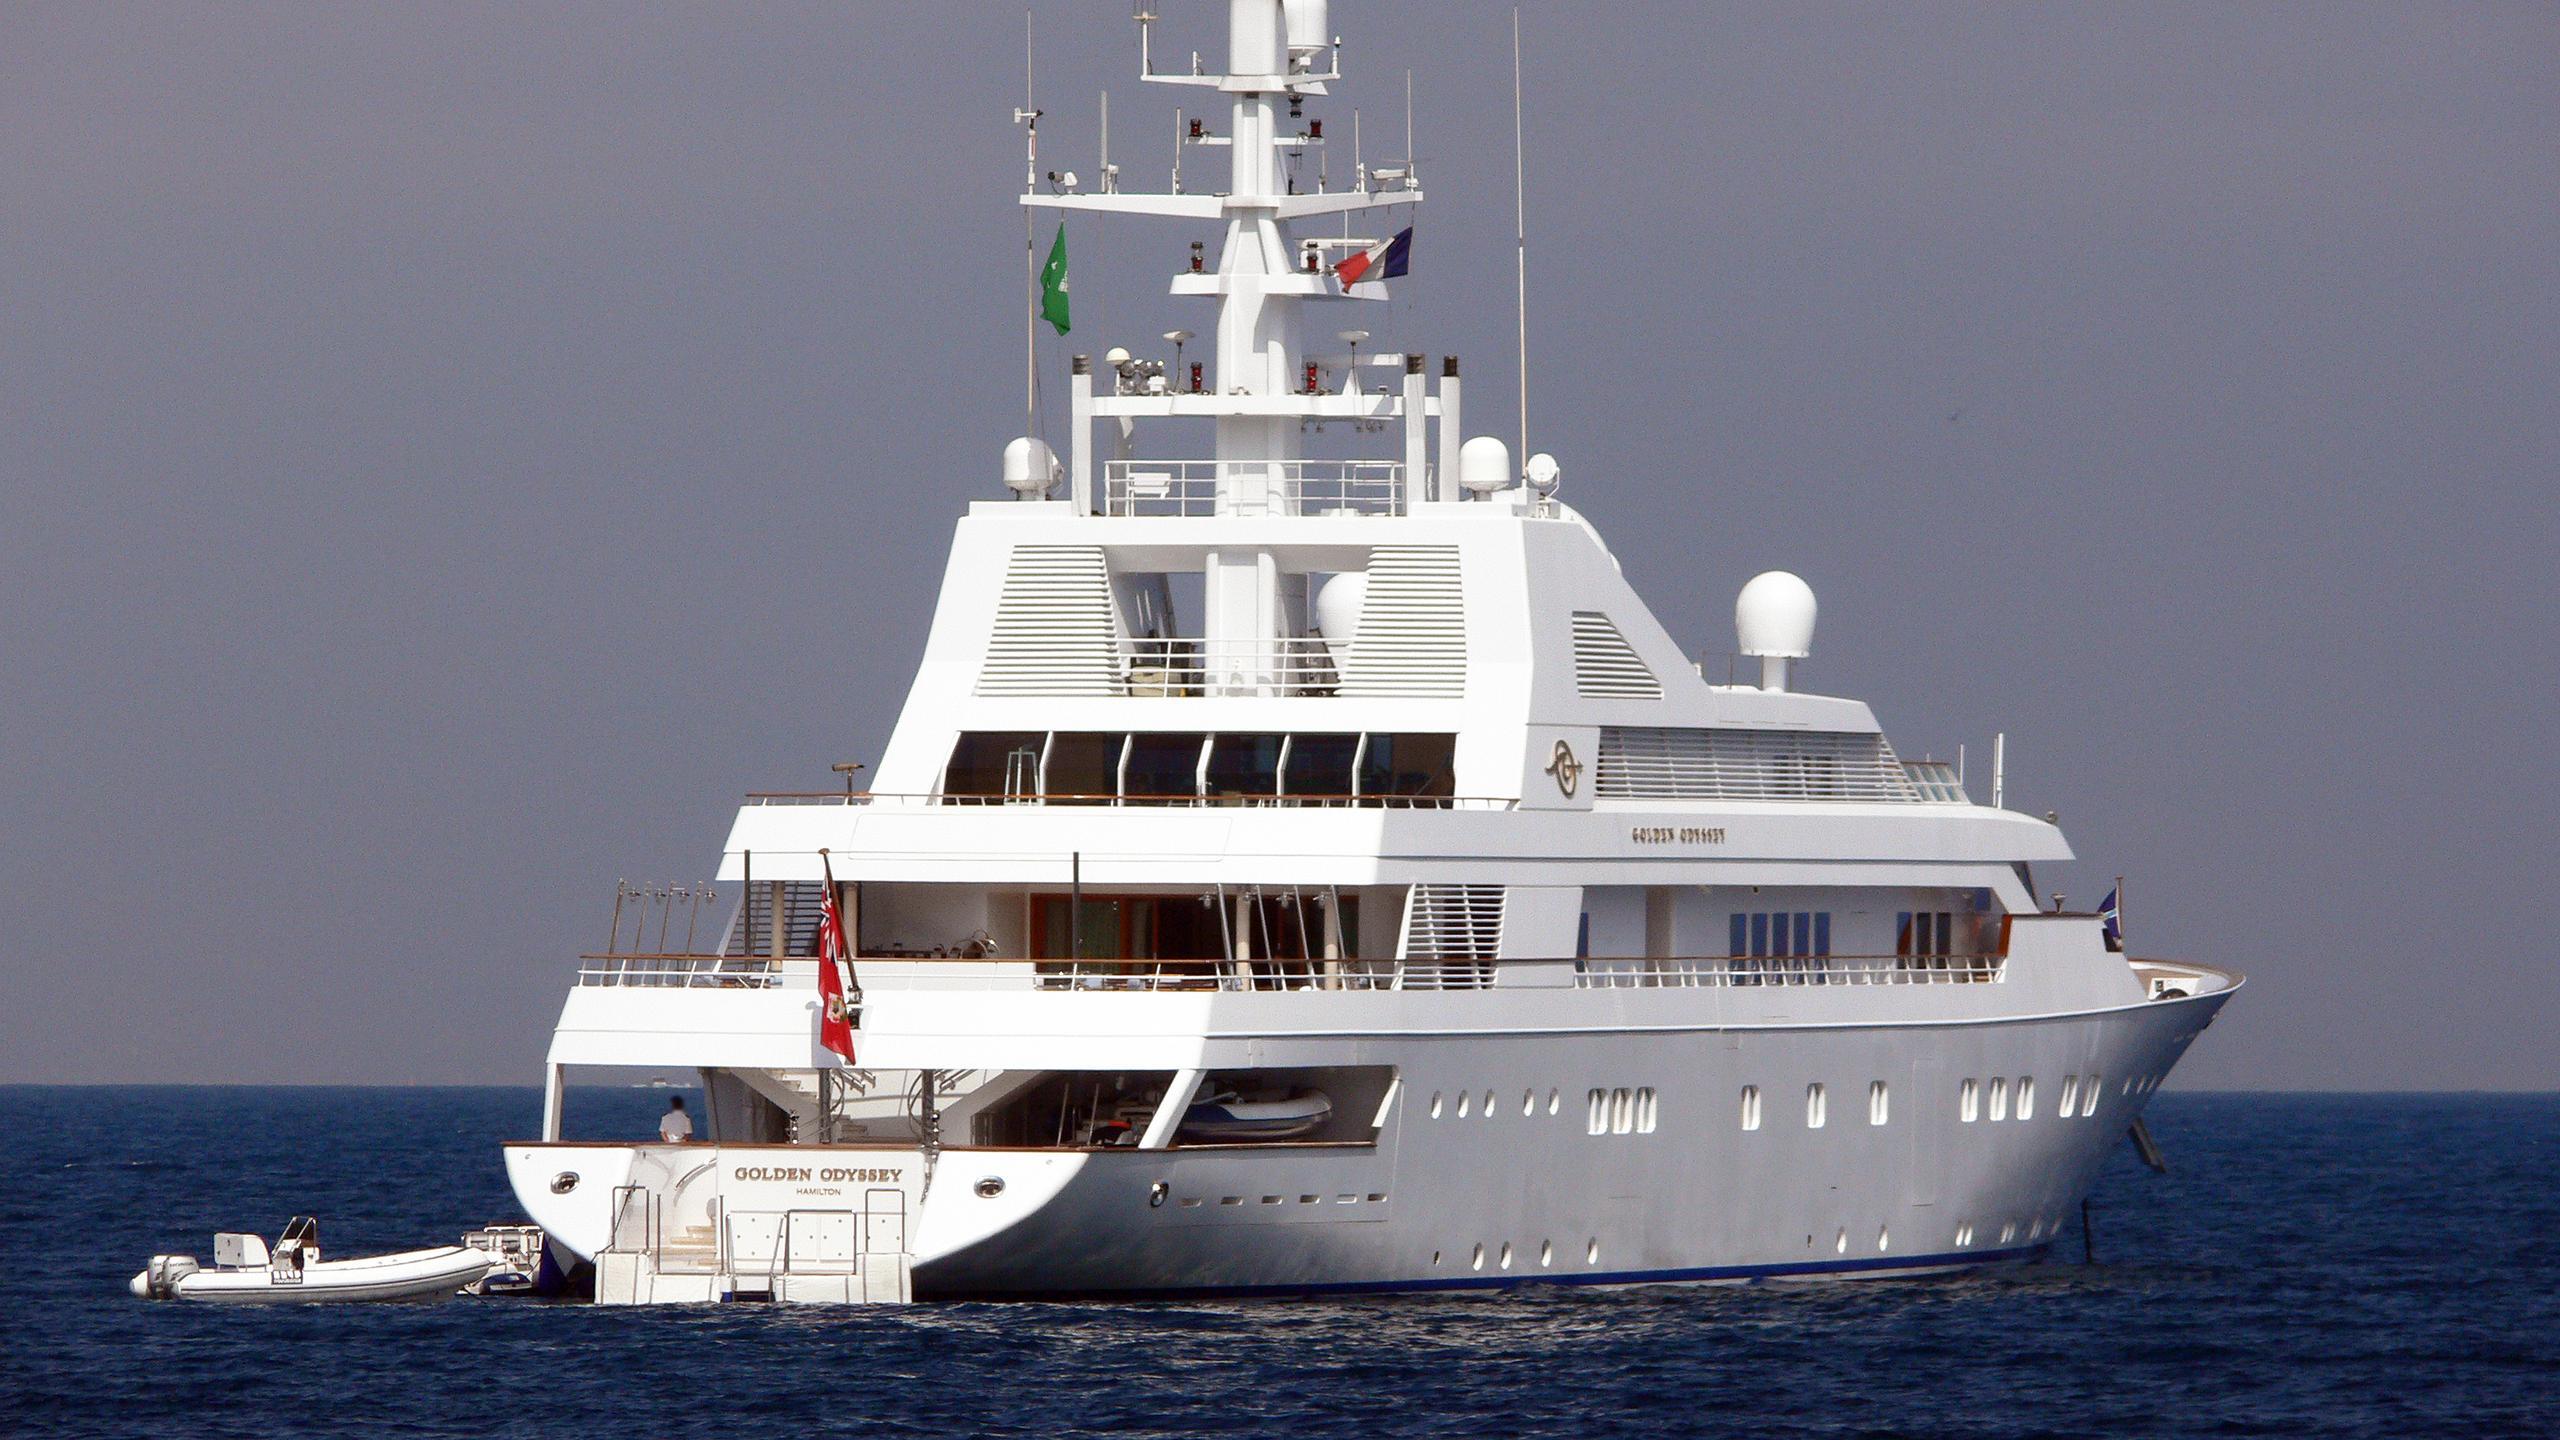 grand-ocean-golden-odyssey-ii-motor-yacht-blohm-voss-1990-80m-stern